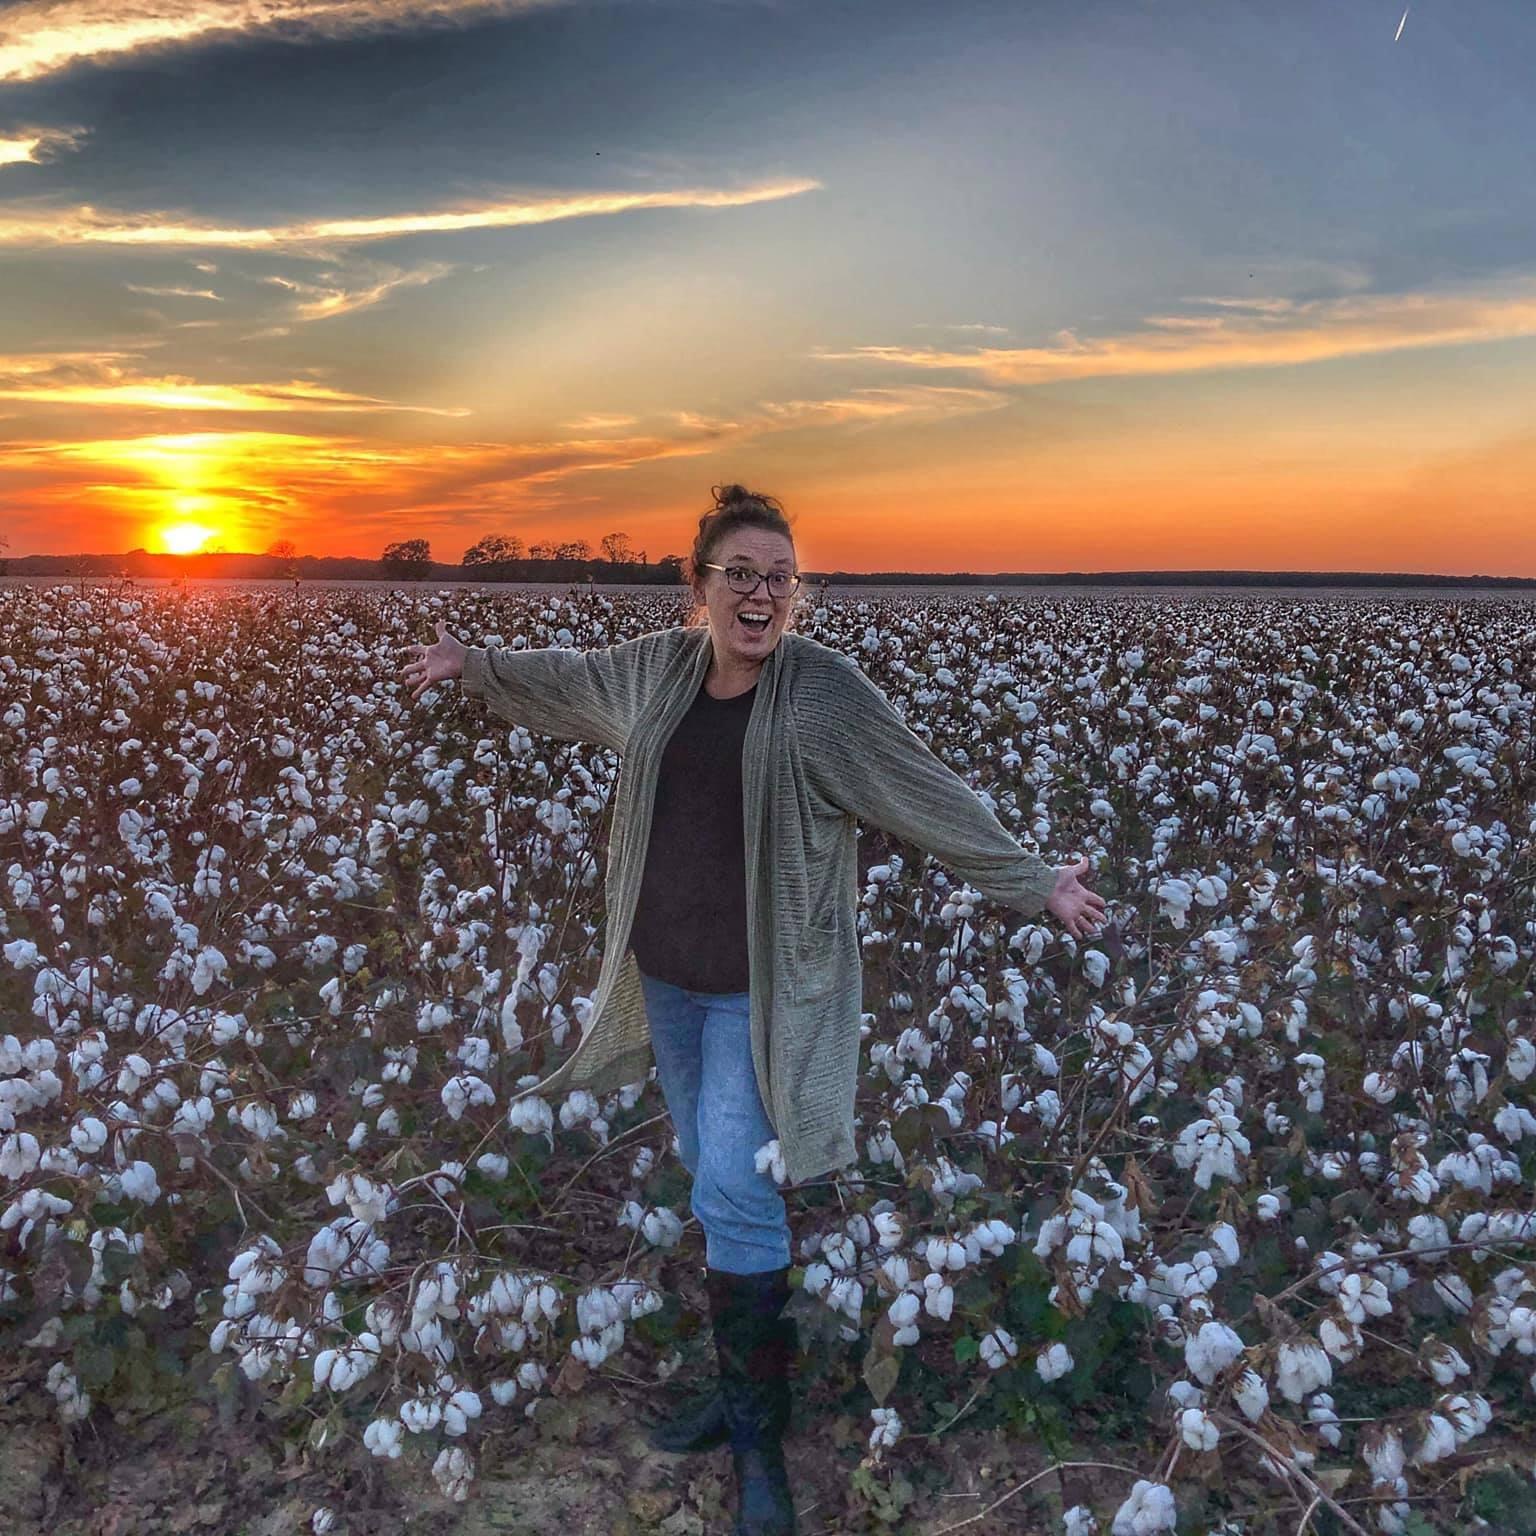 Favorite Portrait taken in cotton field in Greenwood MS by Ruth Sykes of LRC Media